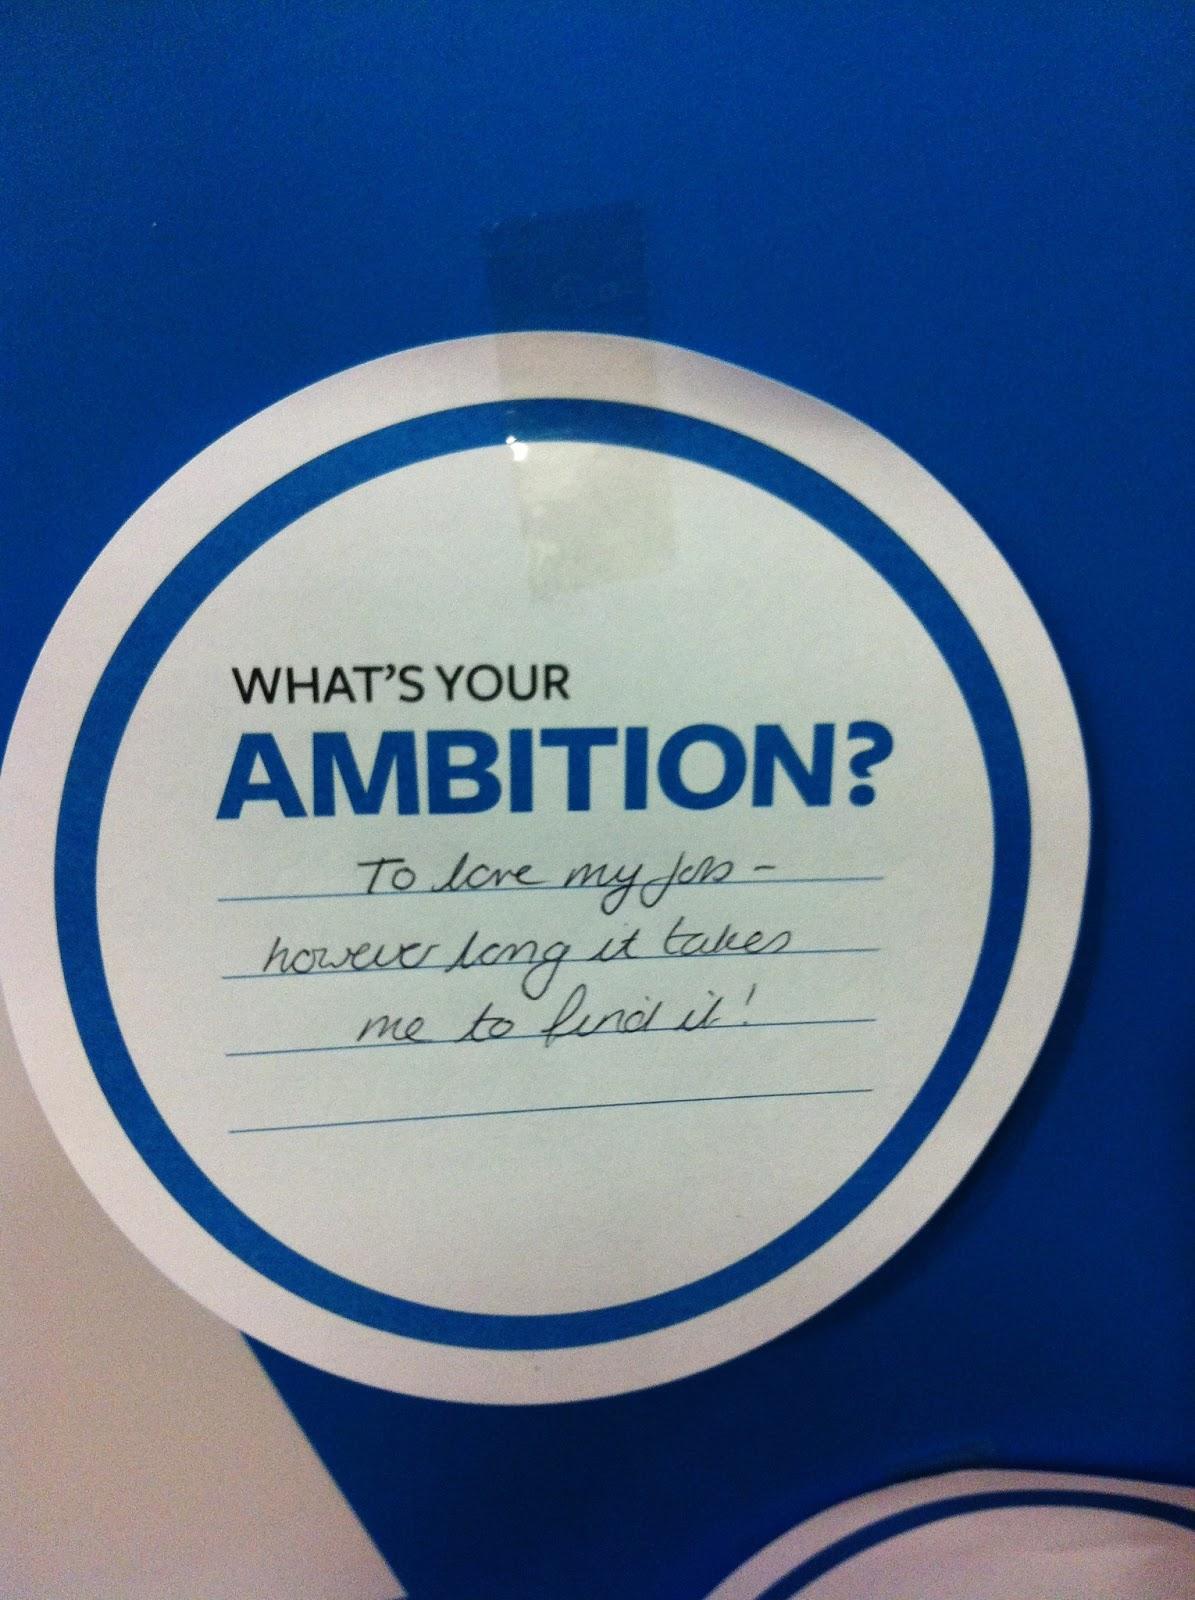 Essay My Ambition